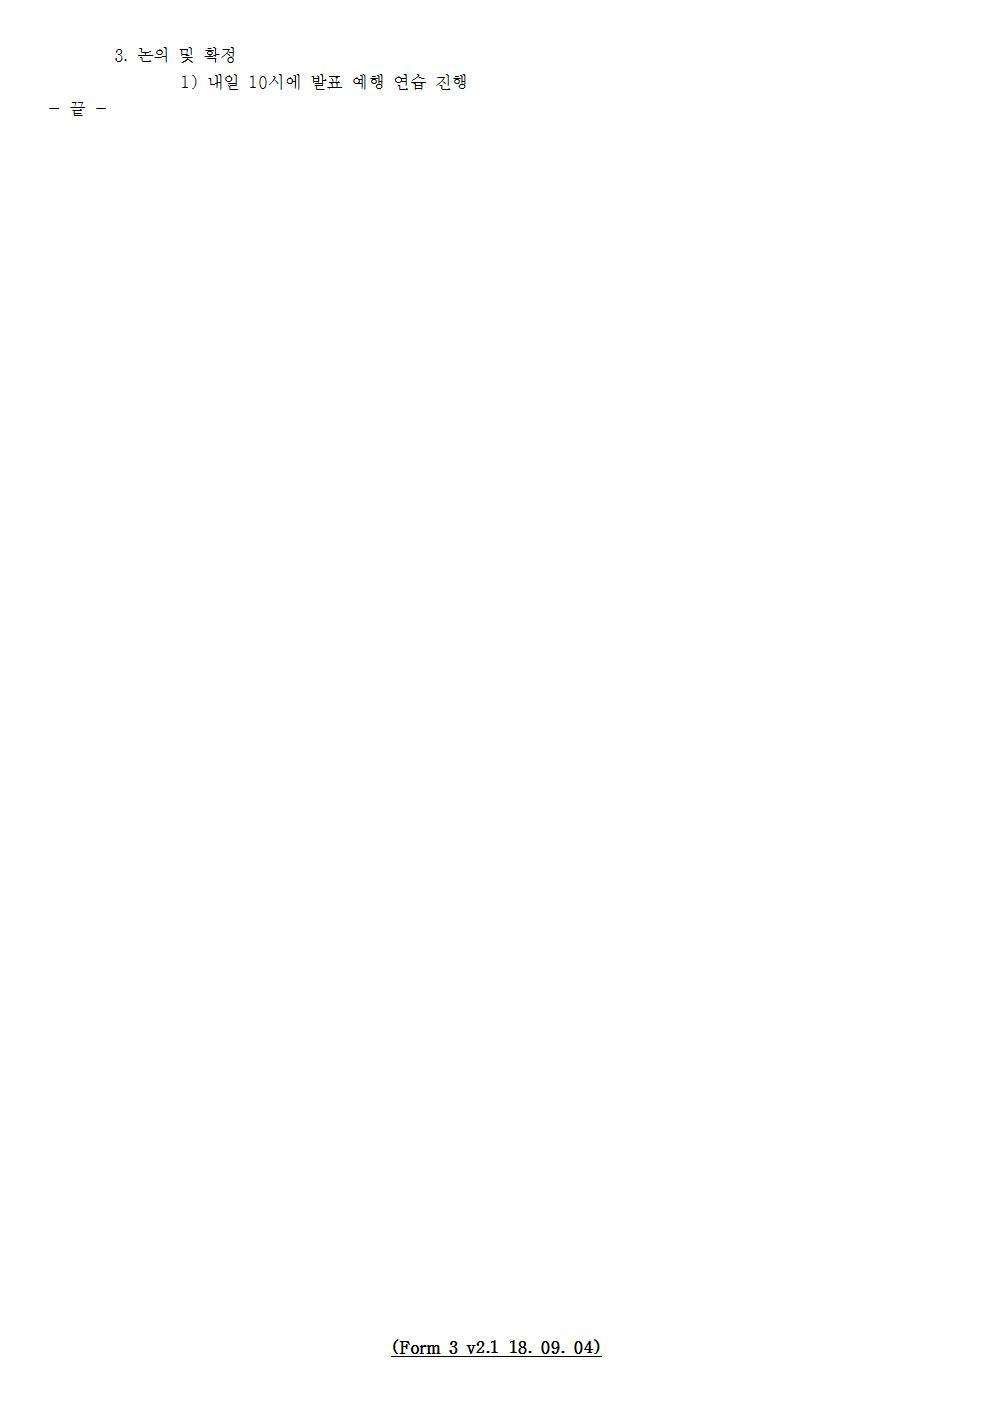 D-[18-056-RD-12]-[국토부_과제_제안서]-[2018-12-03][JS]002.jpg